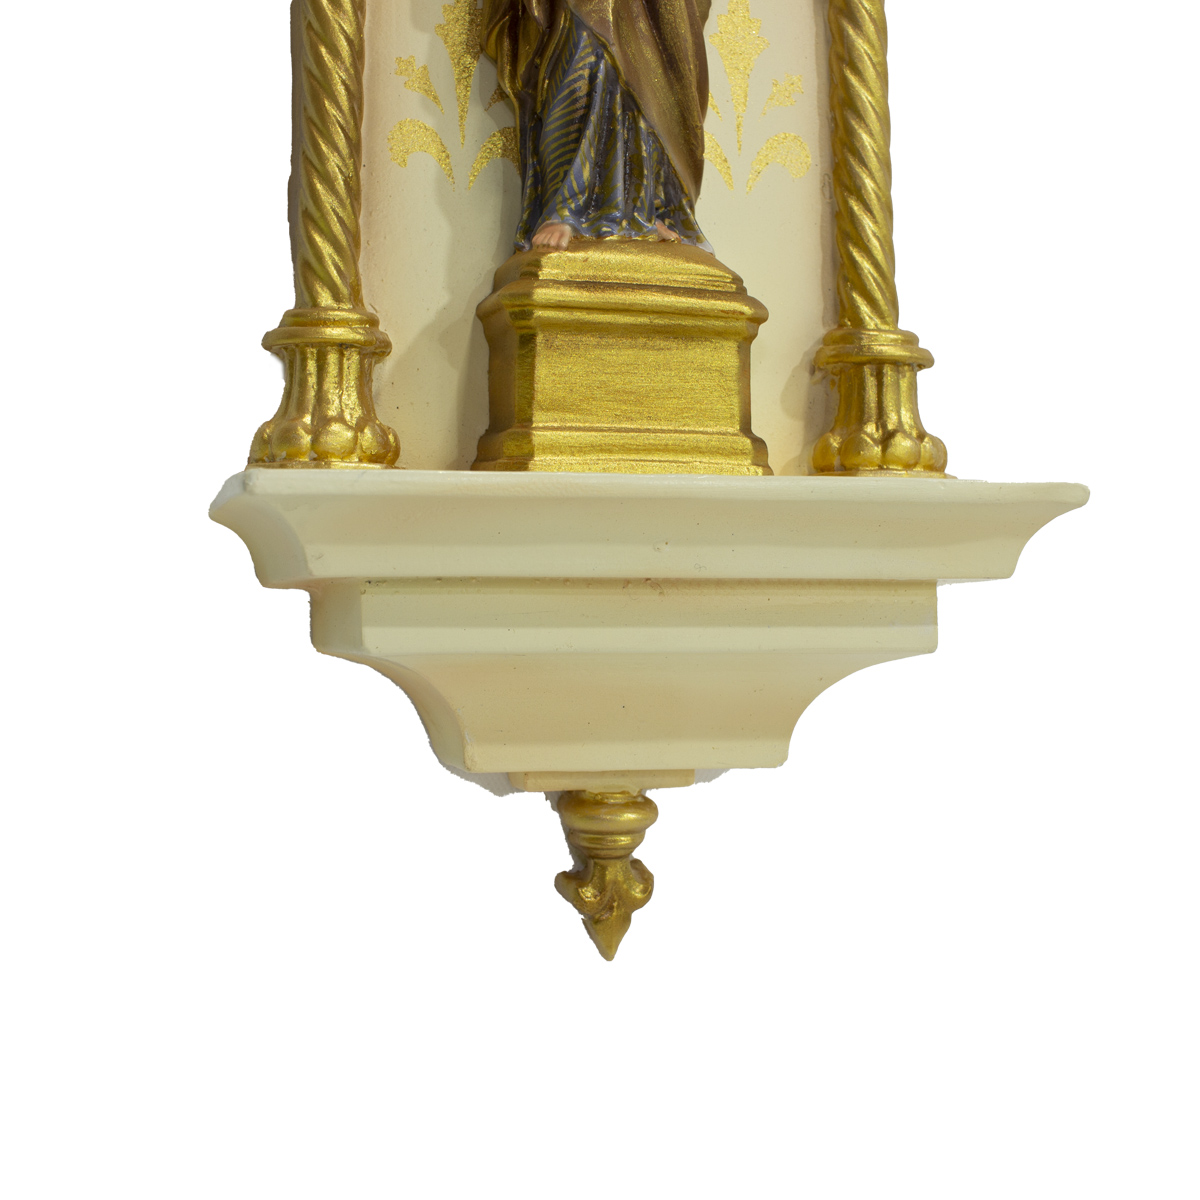 Oratório Gótico São José em Resina Policromado - 46cm